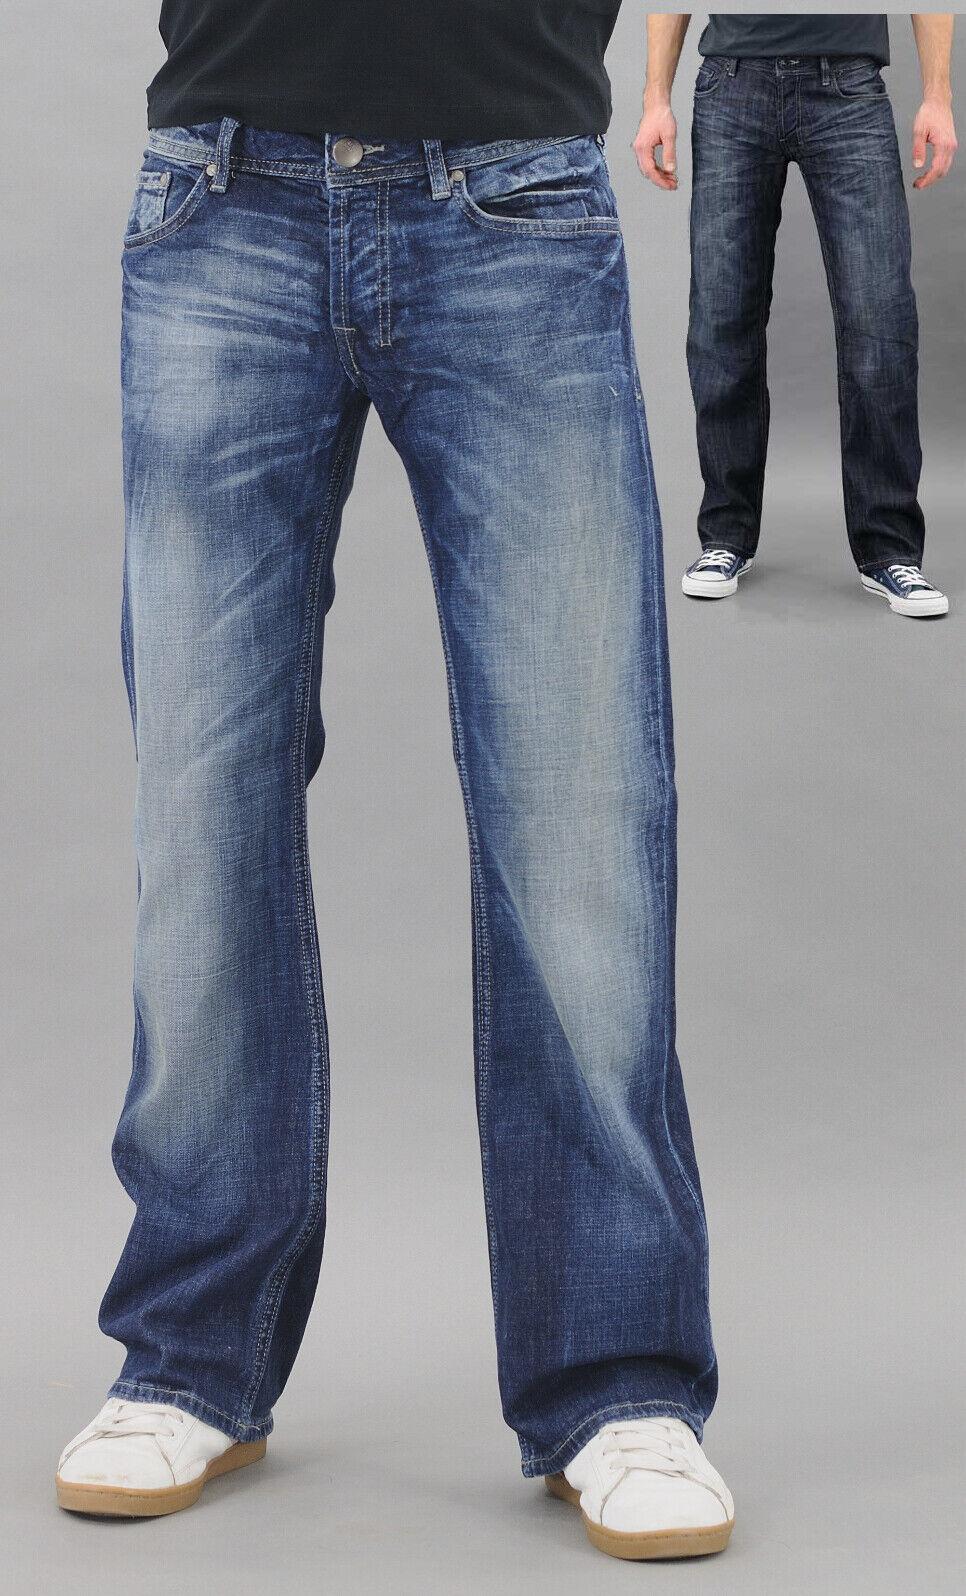 Details zu LTB Jeans Bootcut Tinman Roden Hosen Jeanshose blau regular hellblau dunkelblau